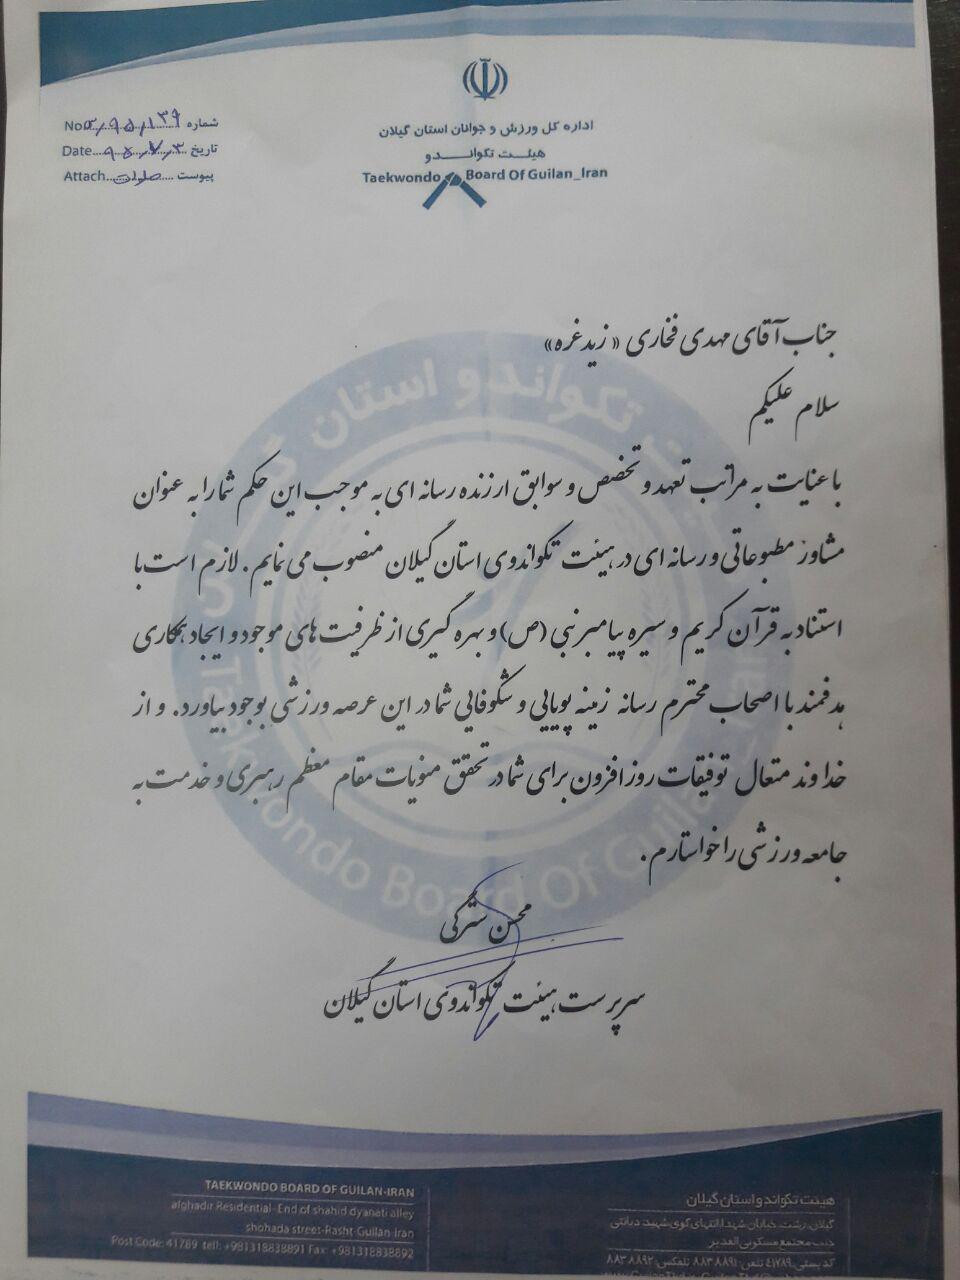 انتخاب مهدي فخاري بعنوان مشاور مطبوعاتي و رسانه اي هيات تكواندو استان گيلان